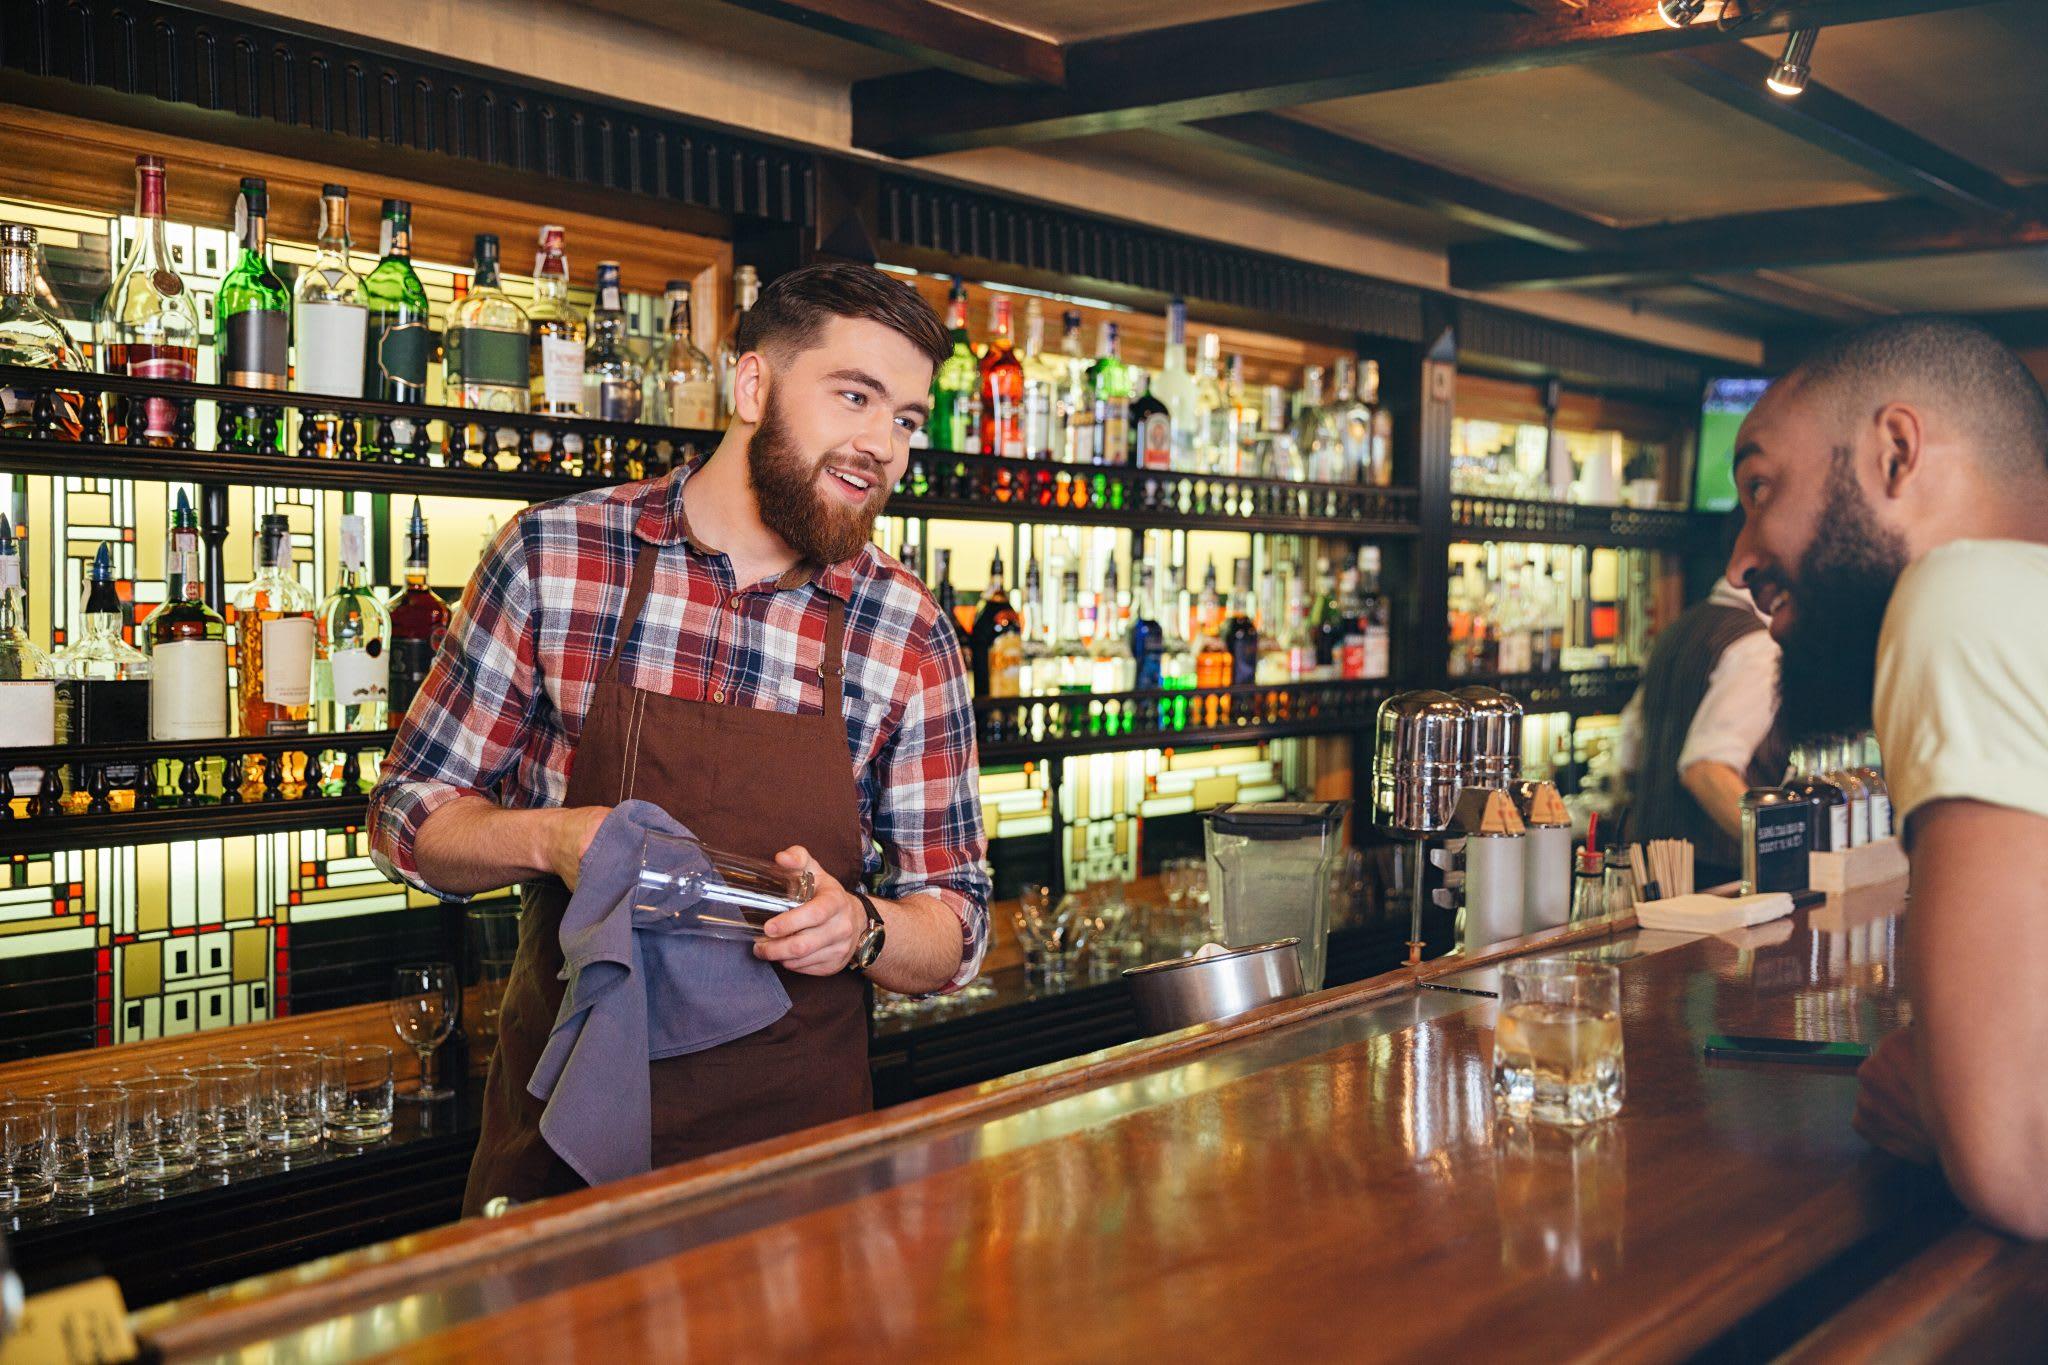 men, bar, bartender, liquor bottles, bar stock control